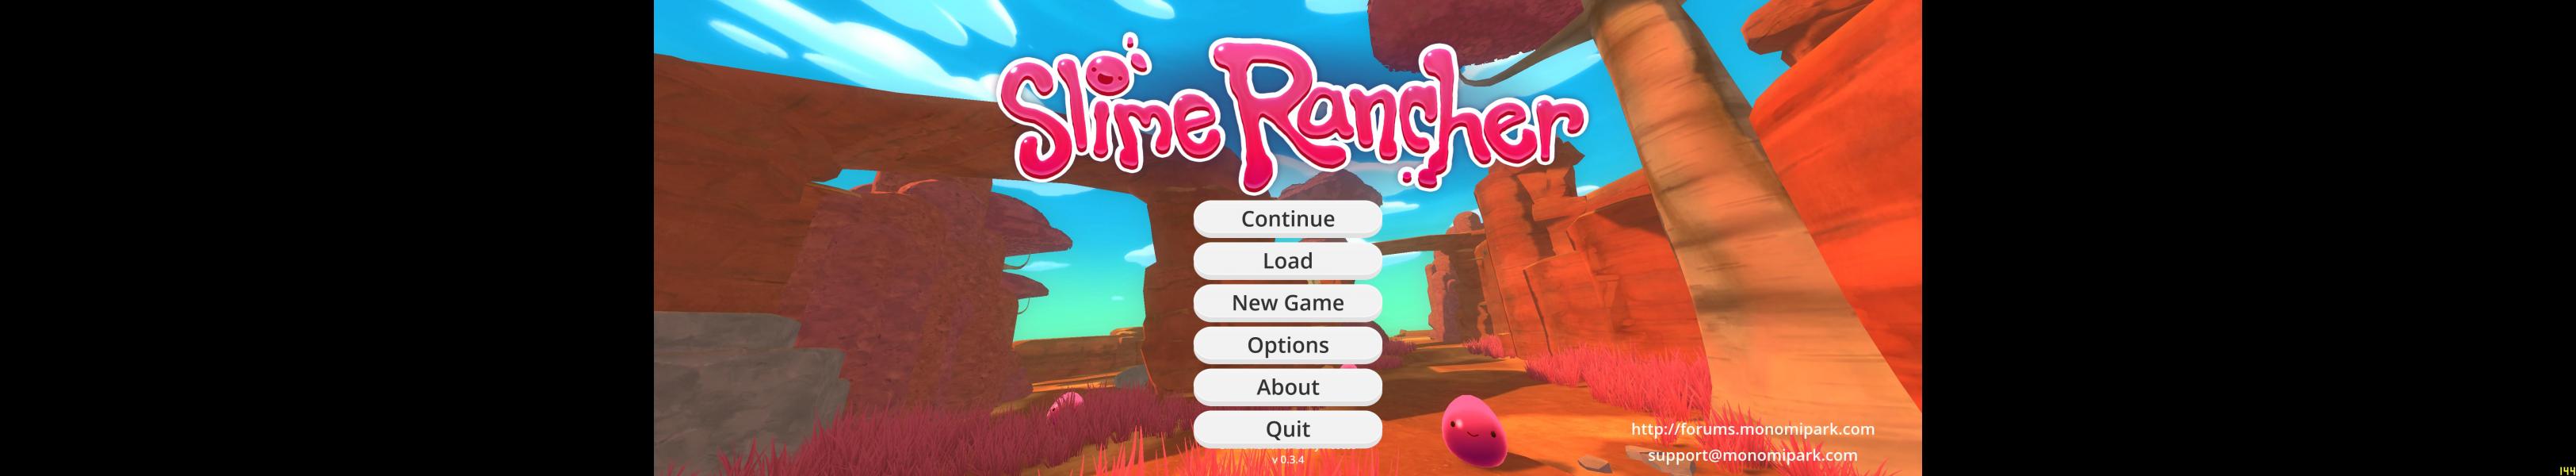 Slime Rancher | WSGF